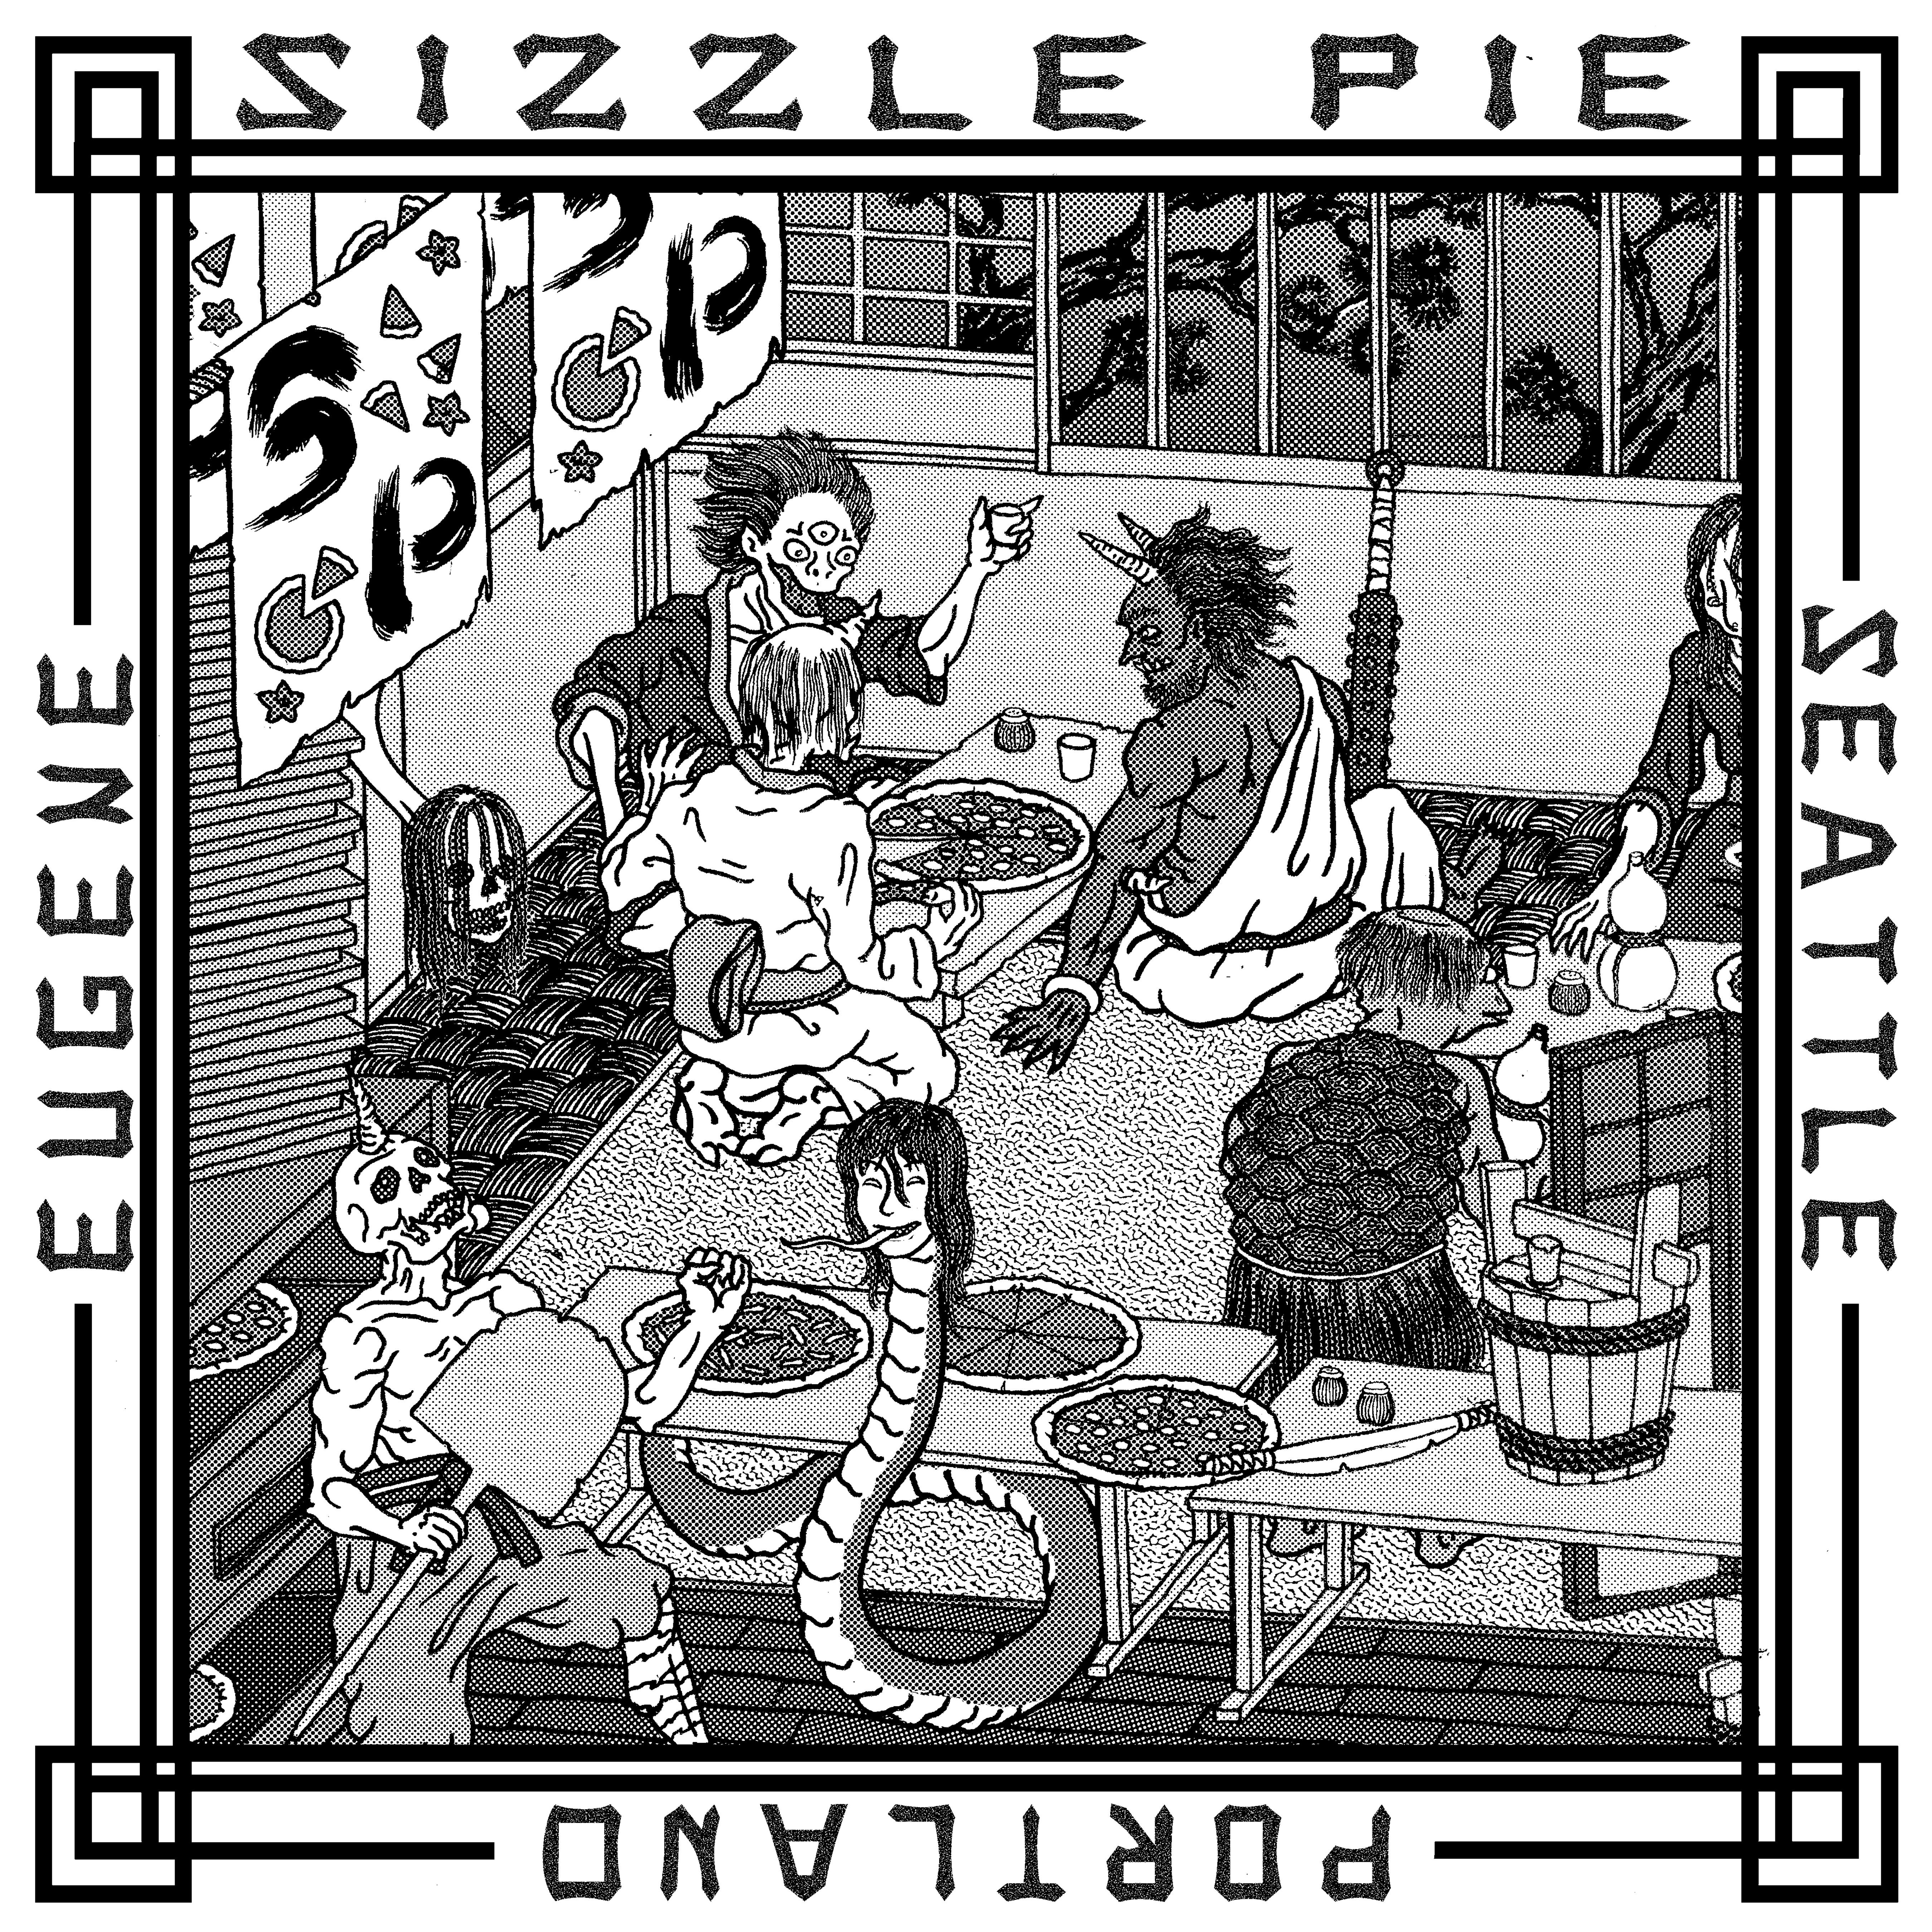 Artist series pizza box artwork, by Chris Bilyeu